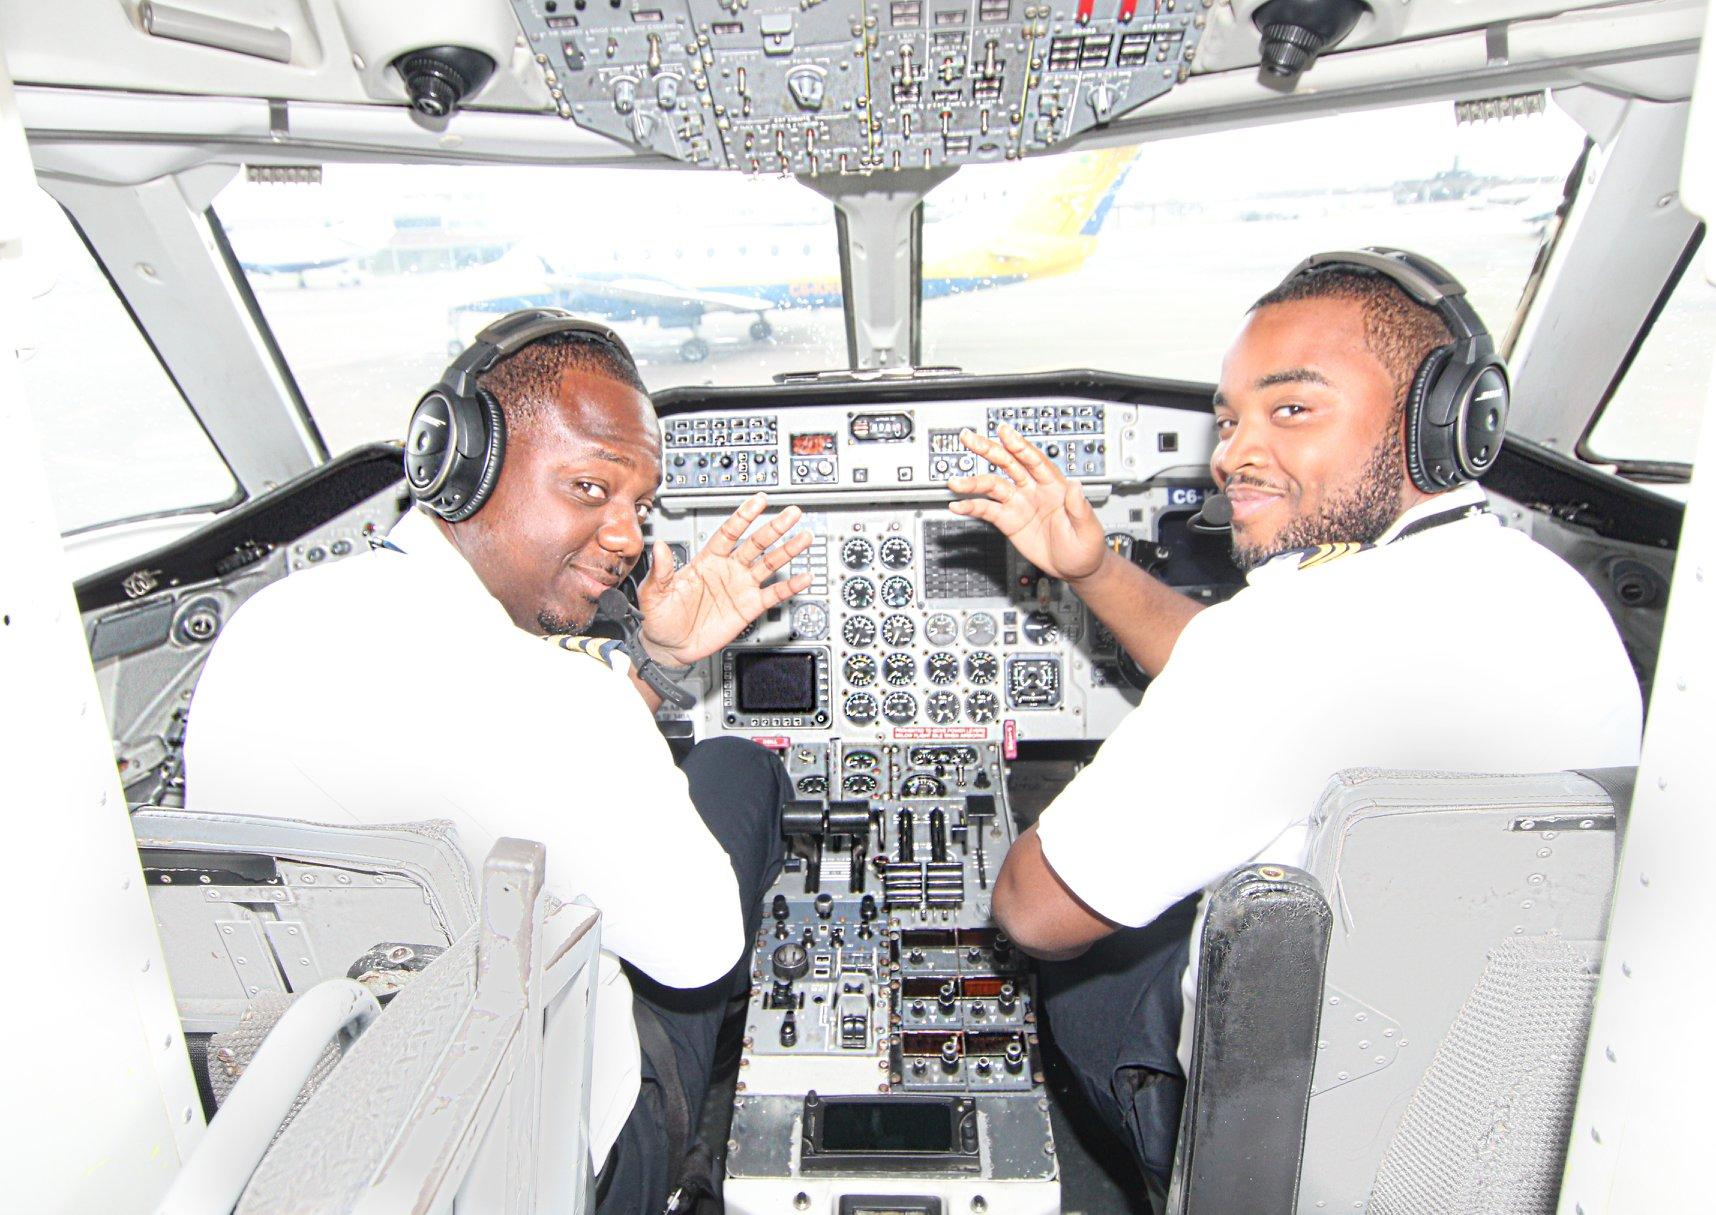 Western Air Crew